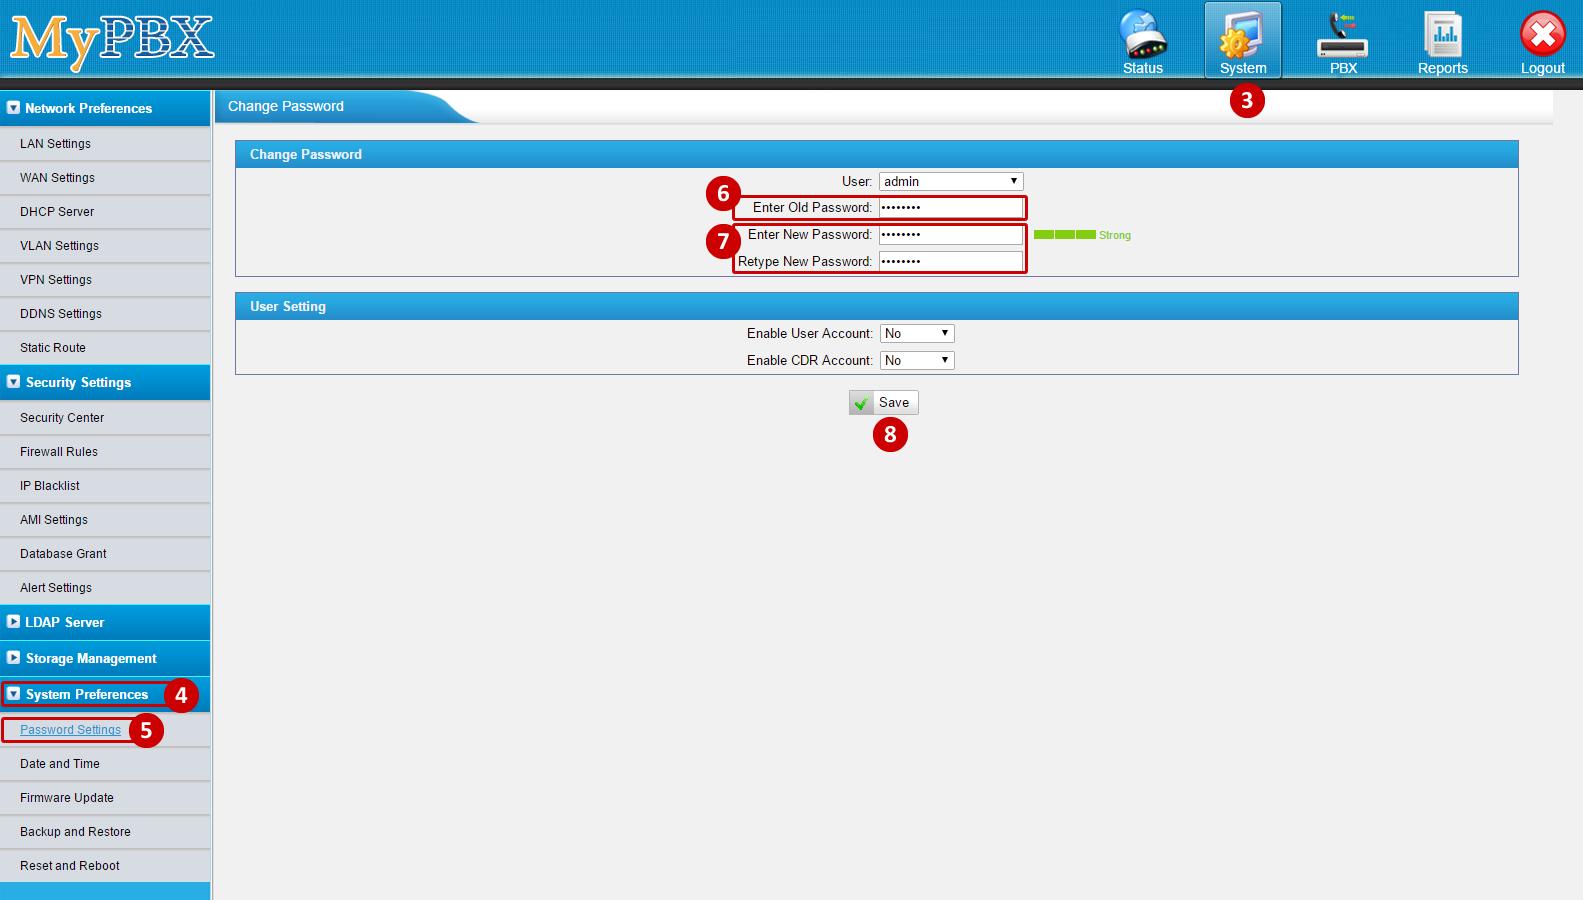 Yeastar MyPBX Configuration Guide - Powered by Kayako Help Desk Software